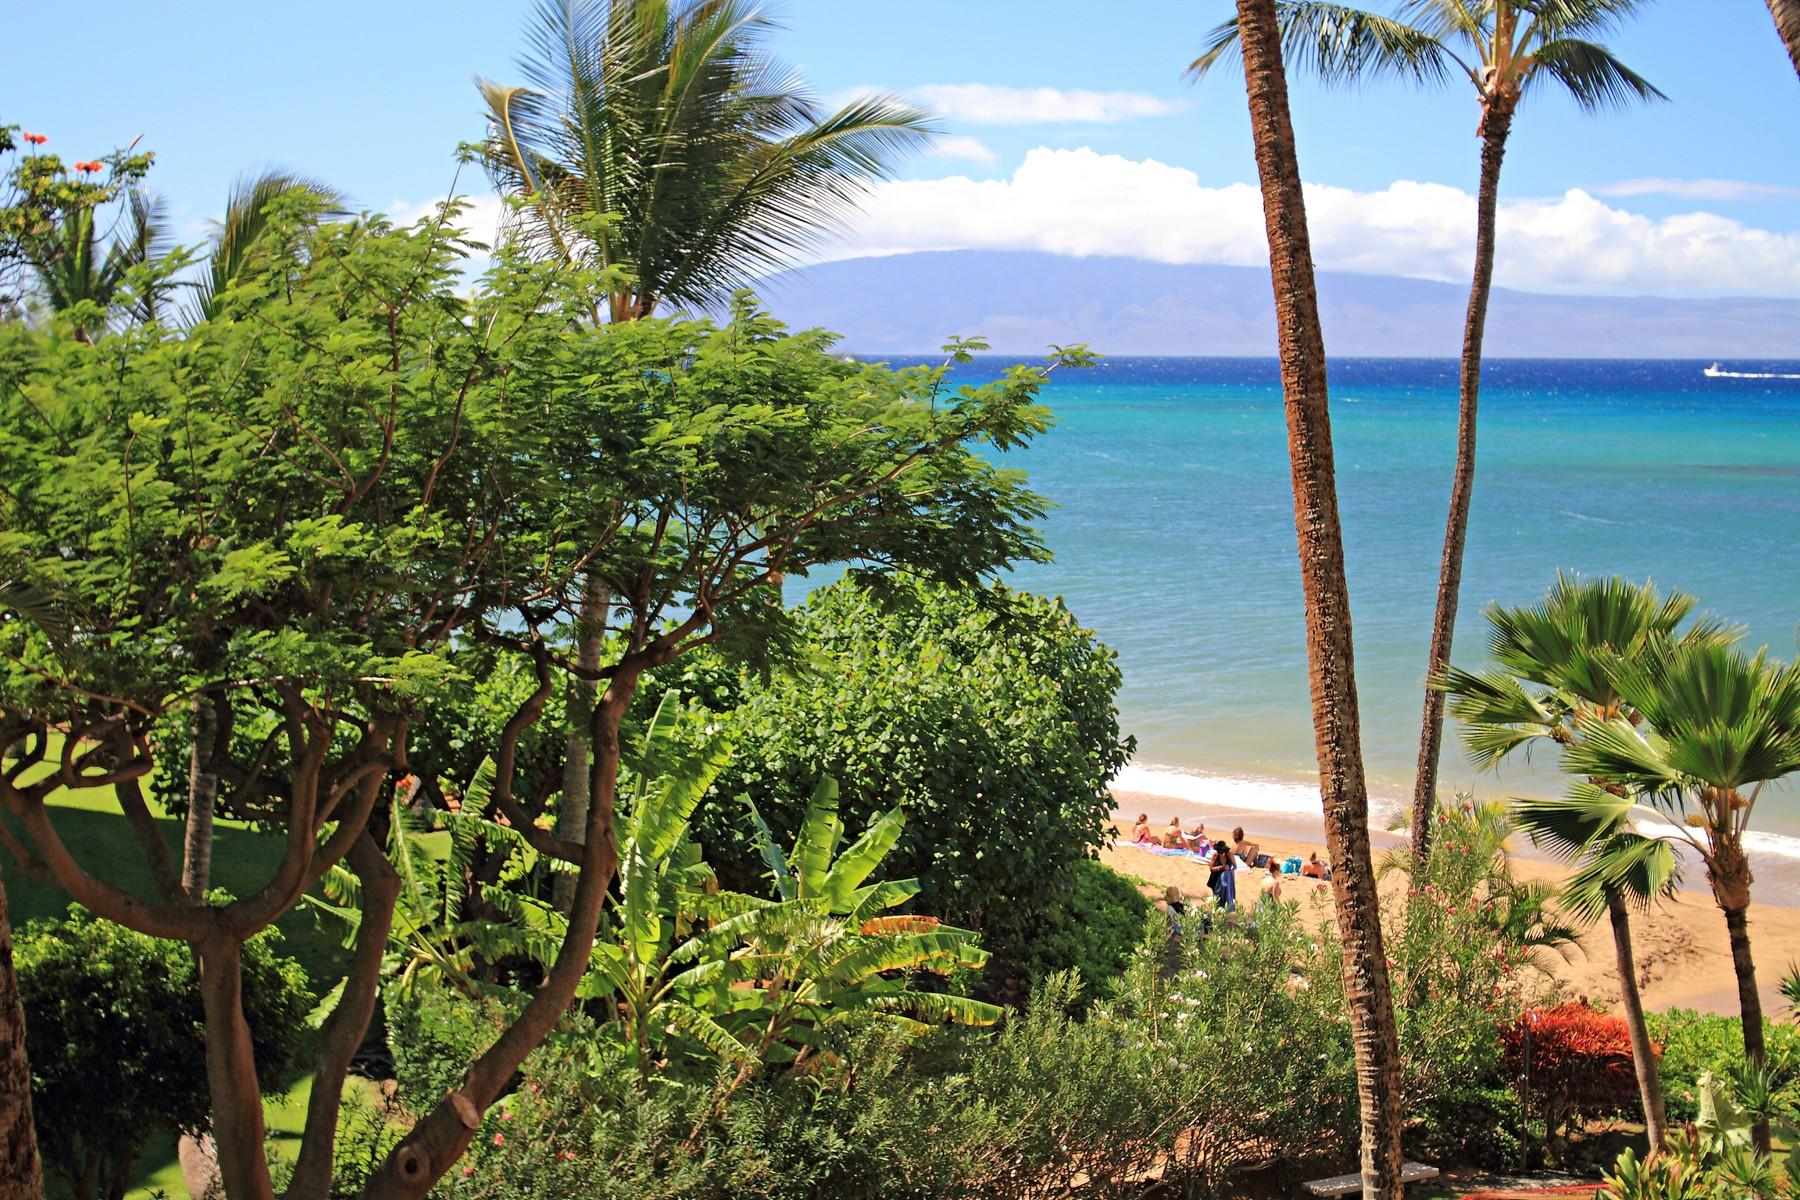 Condominium for Sale at Top of the Line Turn-Key Remodel Great Ocean Views 4327 Lower Honoapiilani Road, Valley Isle Resort 403 Lahaina, Hawaii 96761 United States